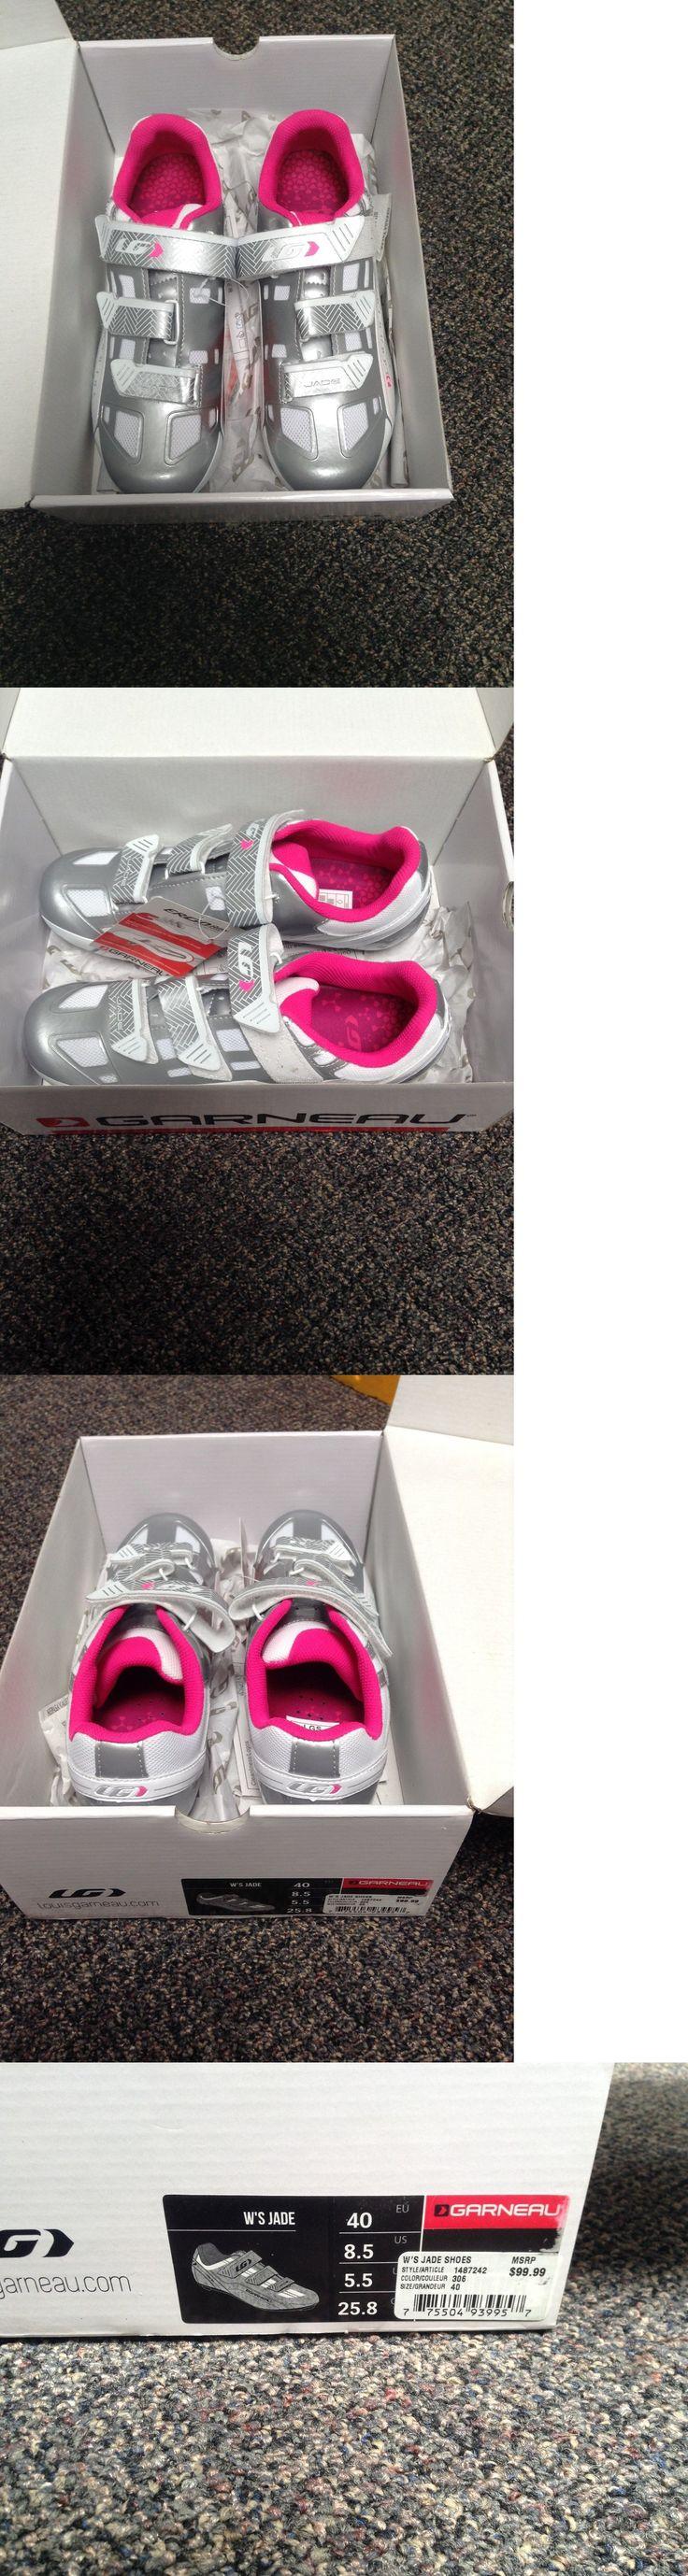 Women 158987: Nwt Nib Cycling Shoes Louis Garneau, Jade, Women S 8.5, Eu 40 Spd -> BUY IT NOW ONLY: $30 on eBay!